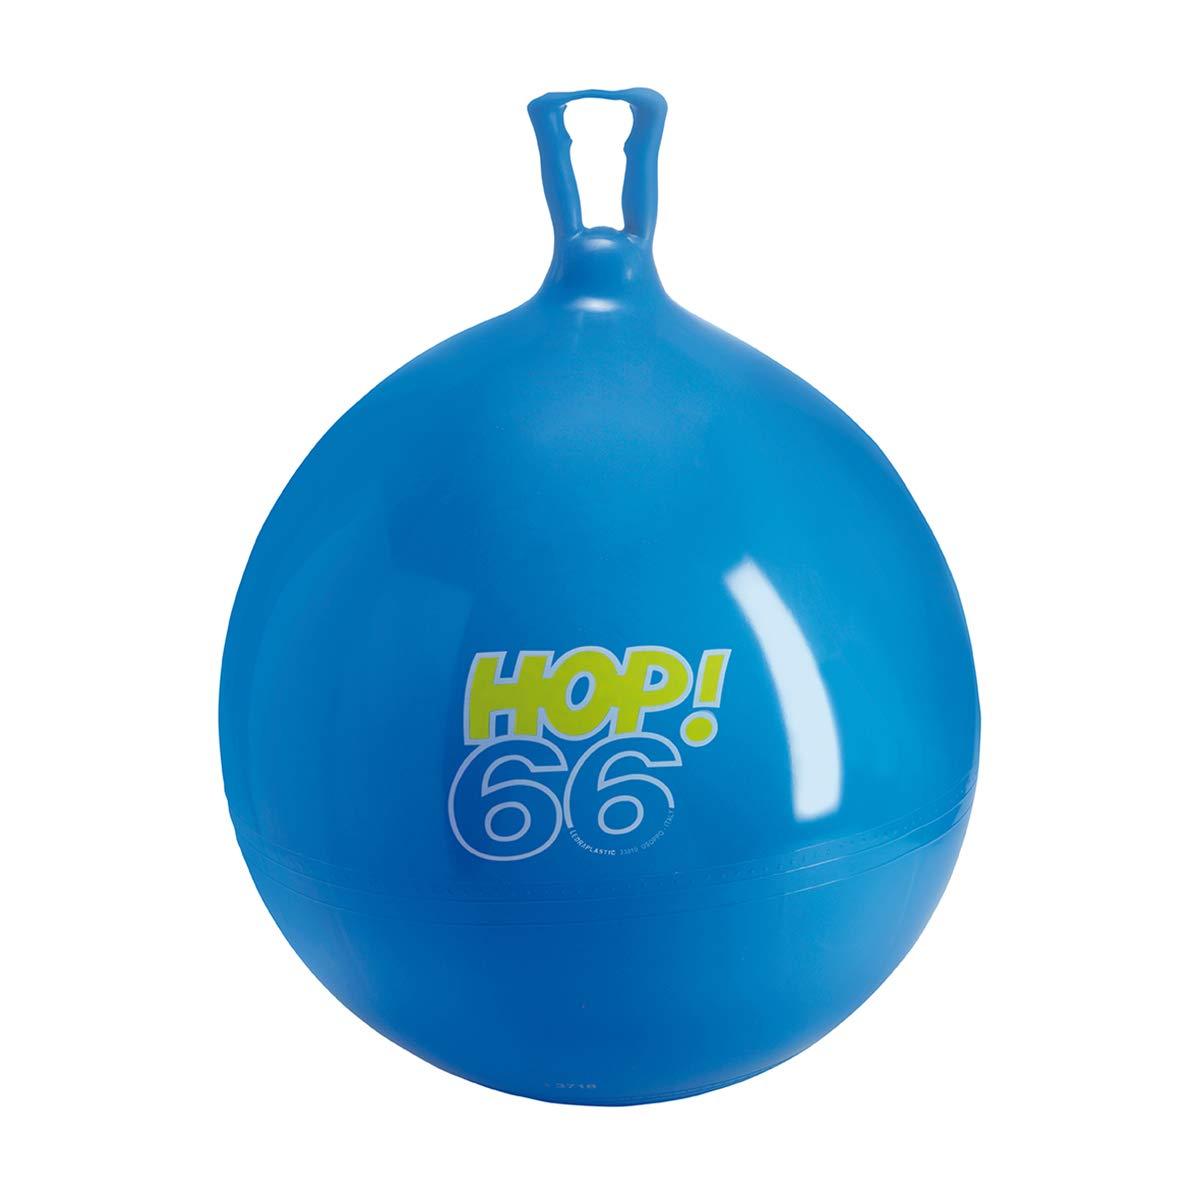 Gymnic / Hop-66 26'' Hop Ball, Blue